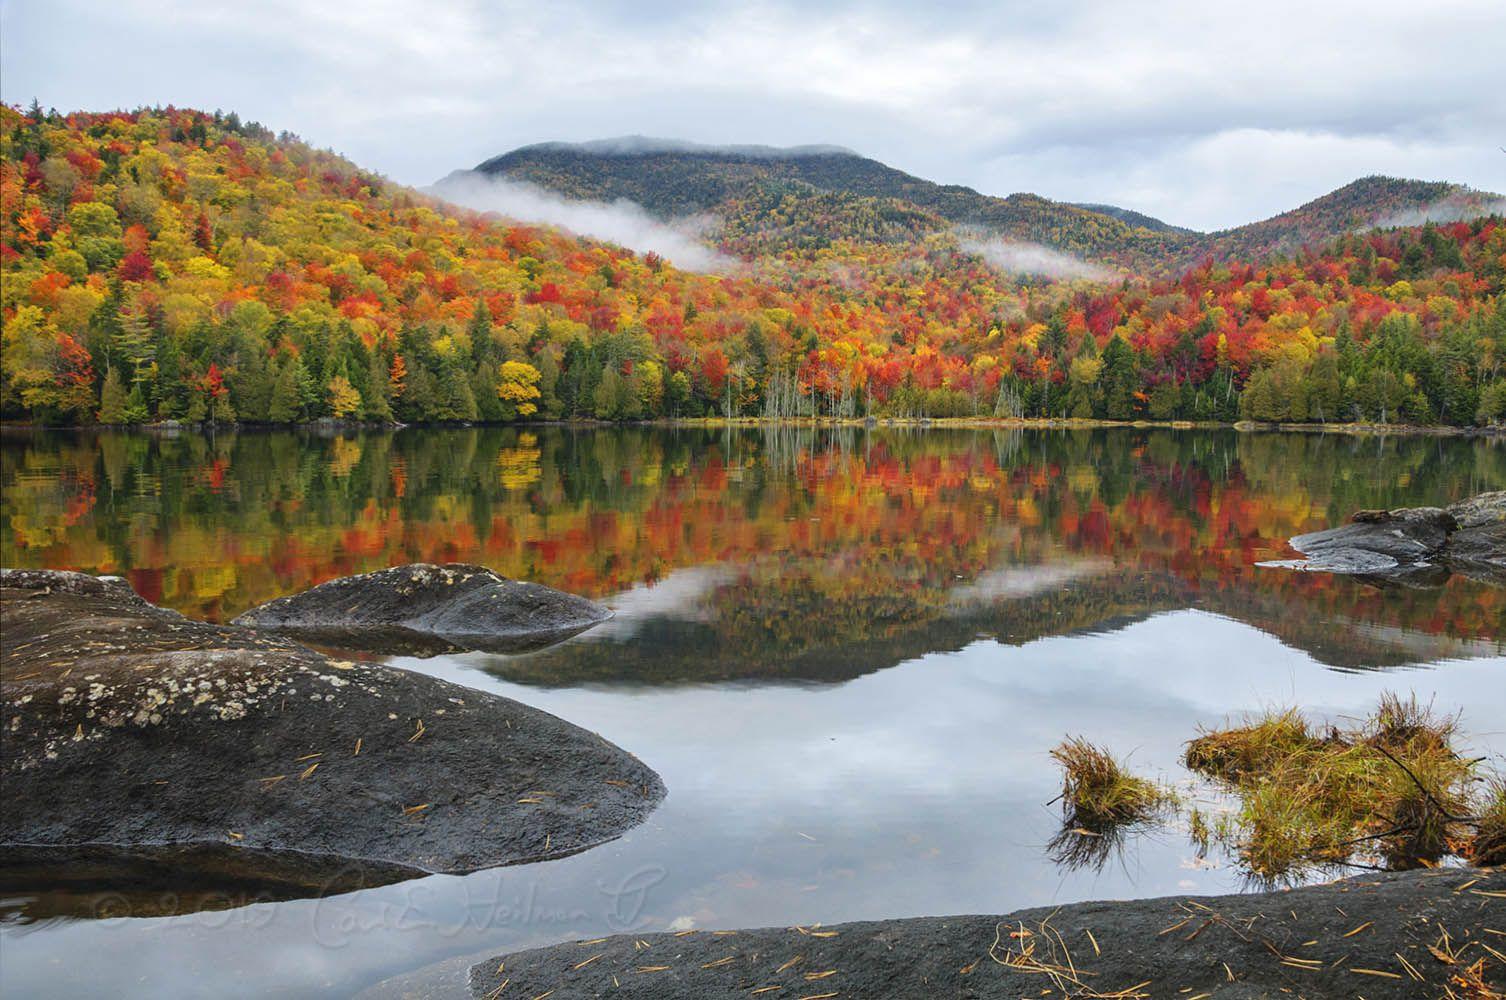 3 The Trails of the Adirondacks - Fall lake